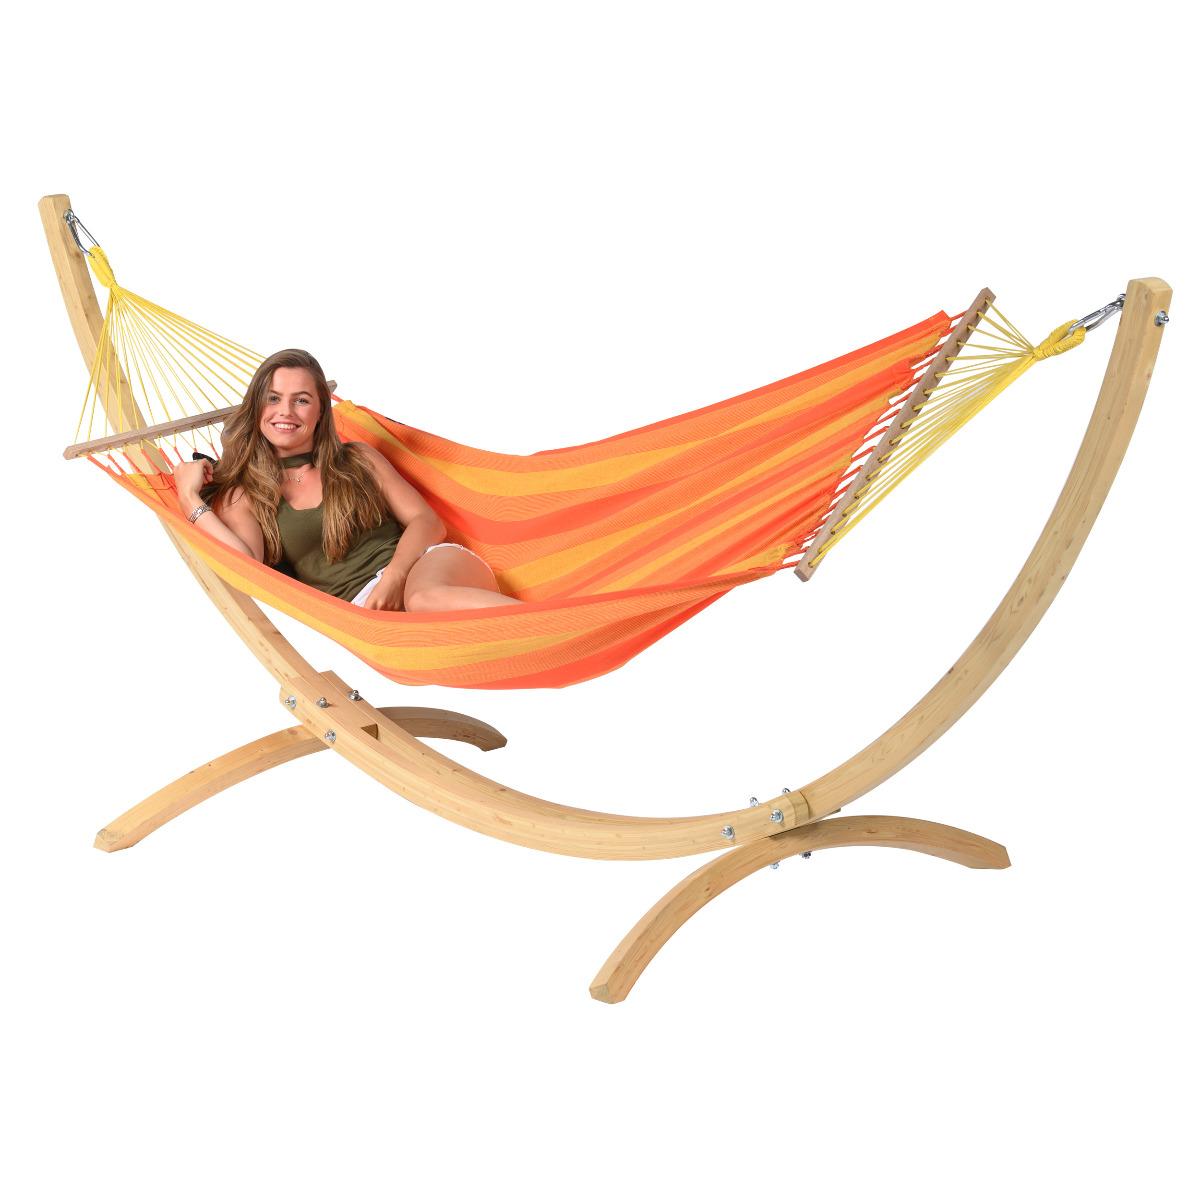 'Wood & Relax' Orange E�npersoons Hangmatset - Oranje - Tropilex �